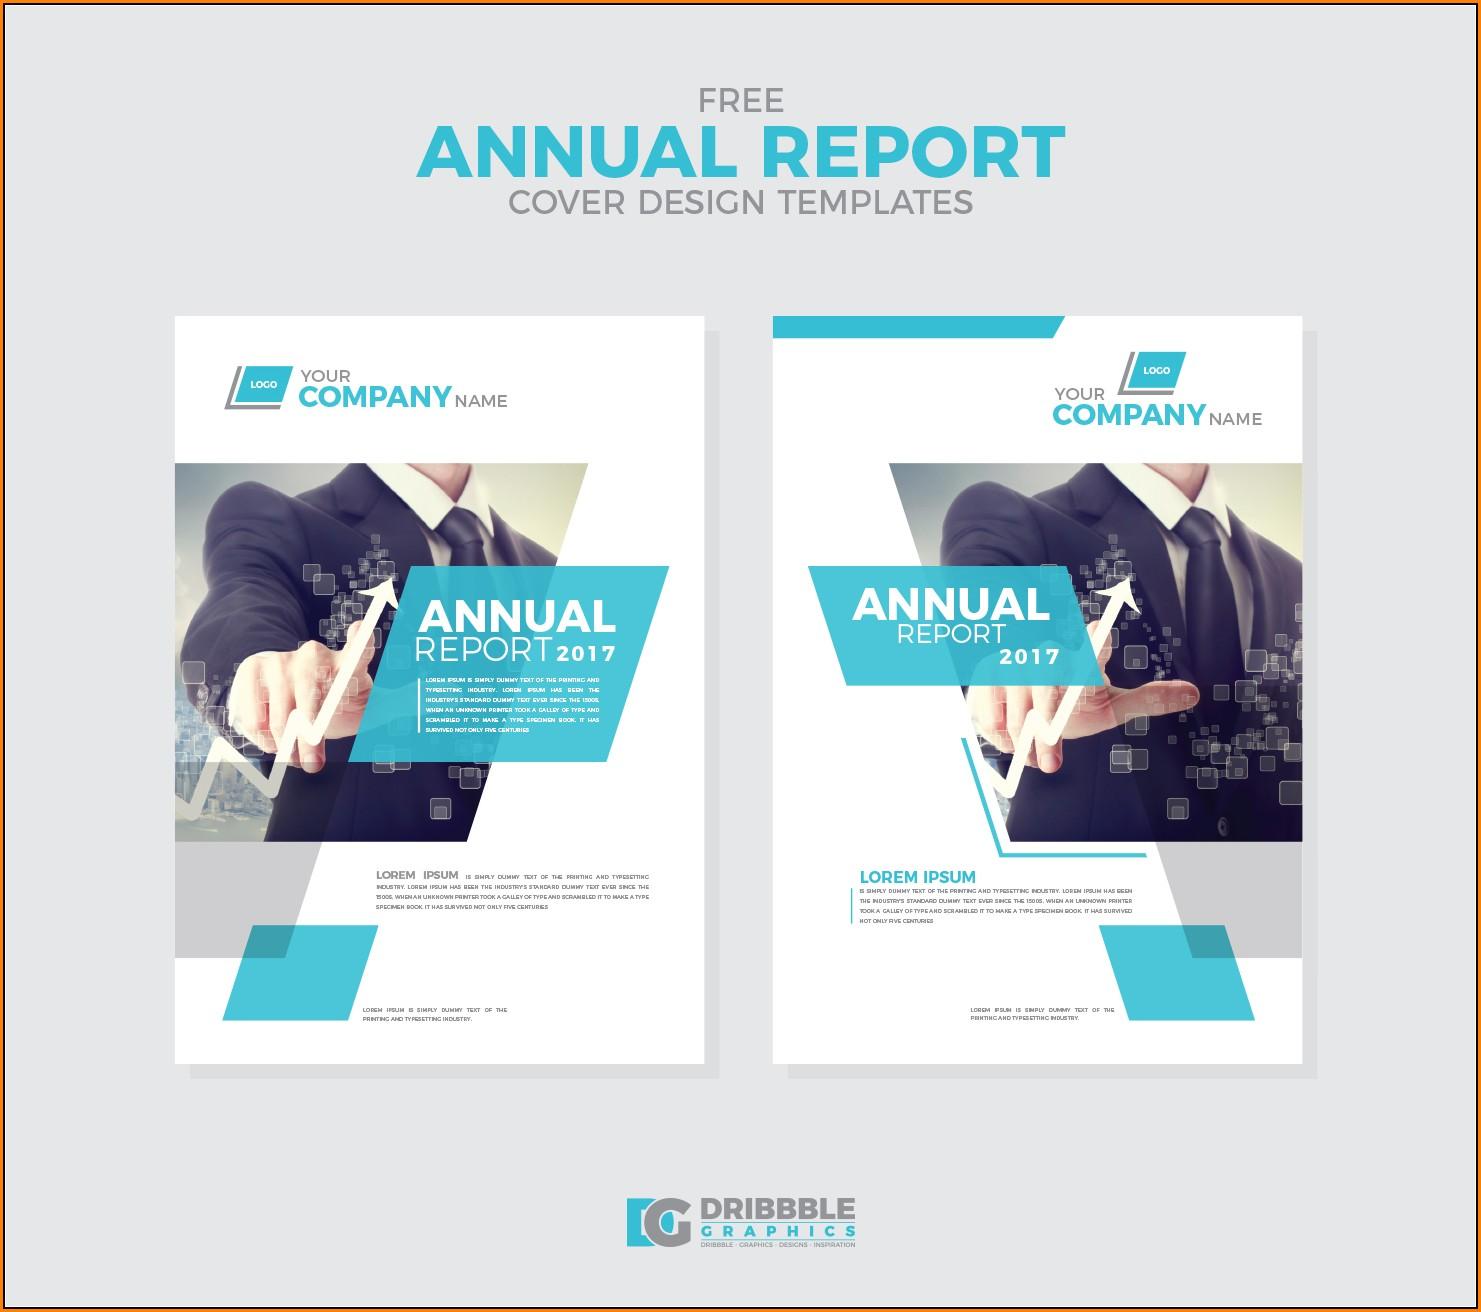 Annual Report Design Templates Free